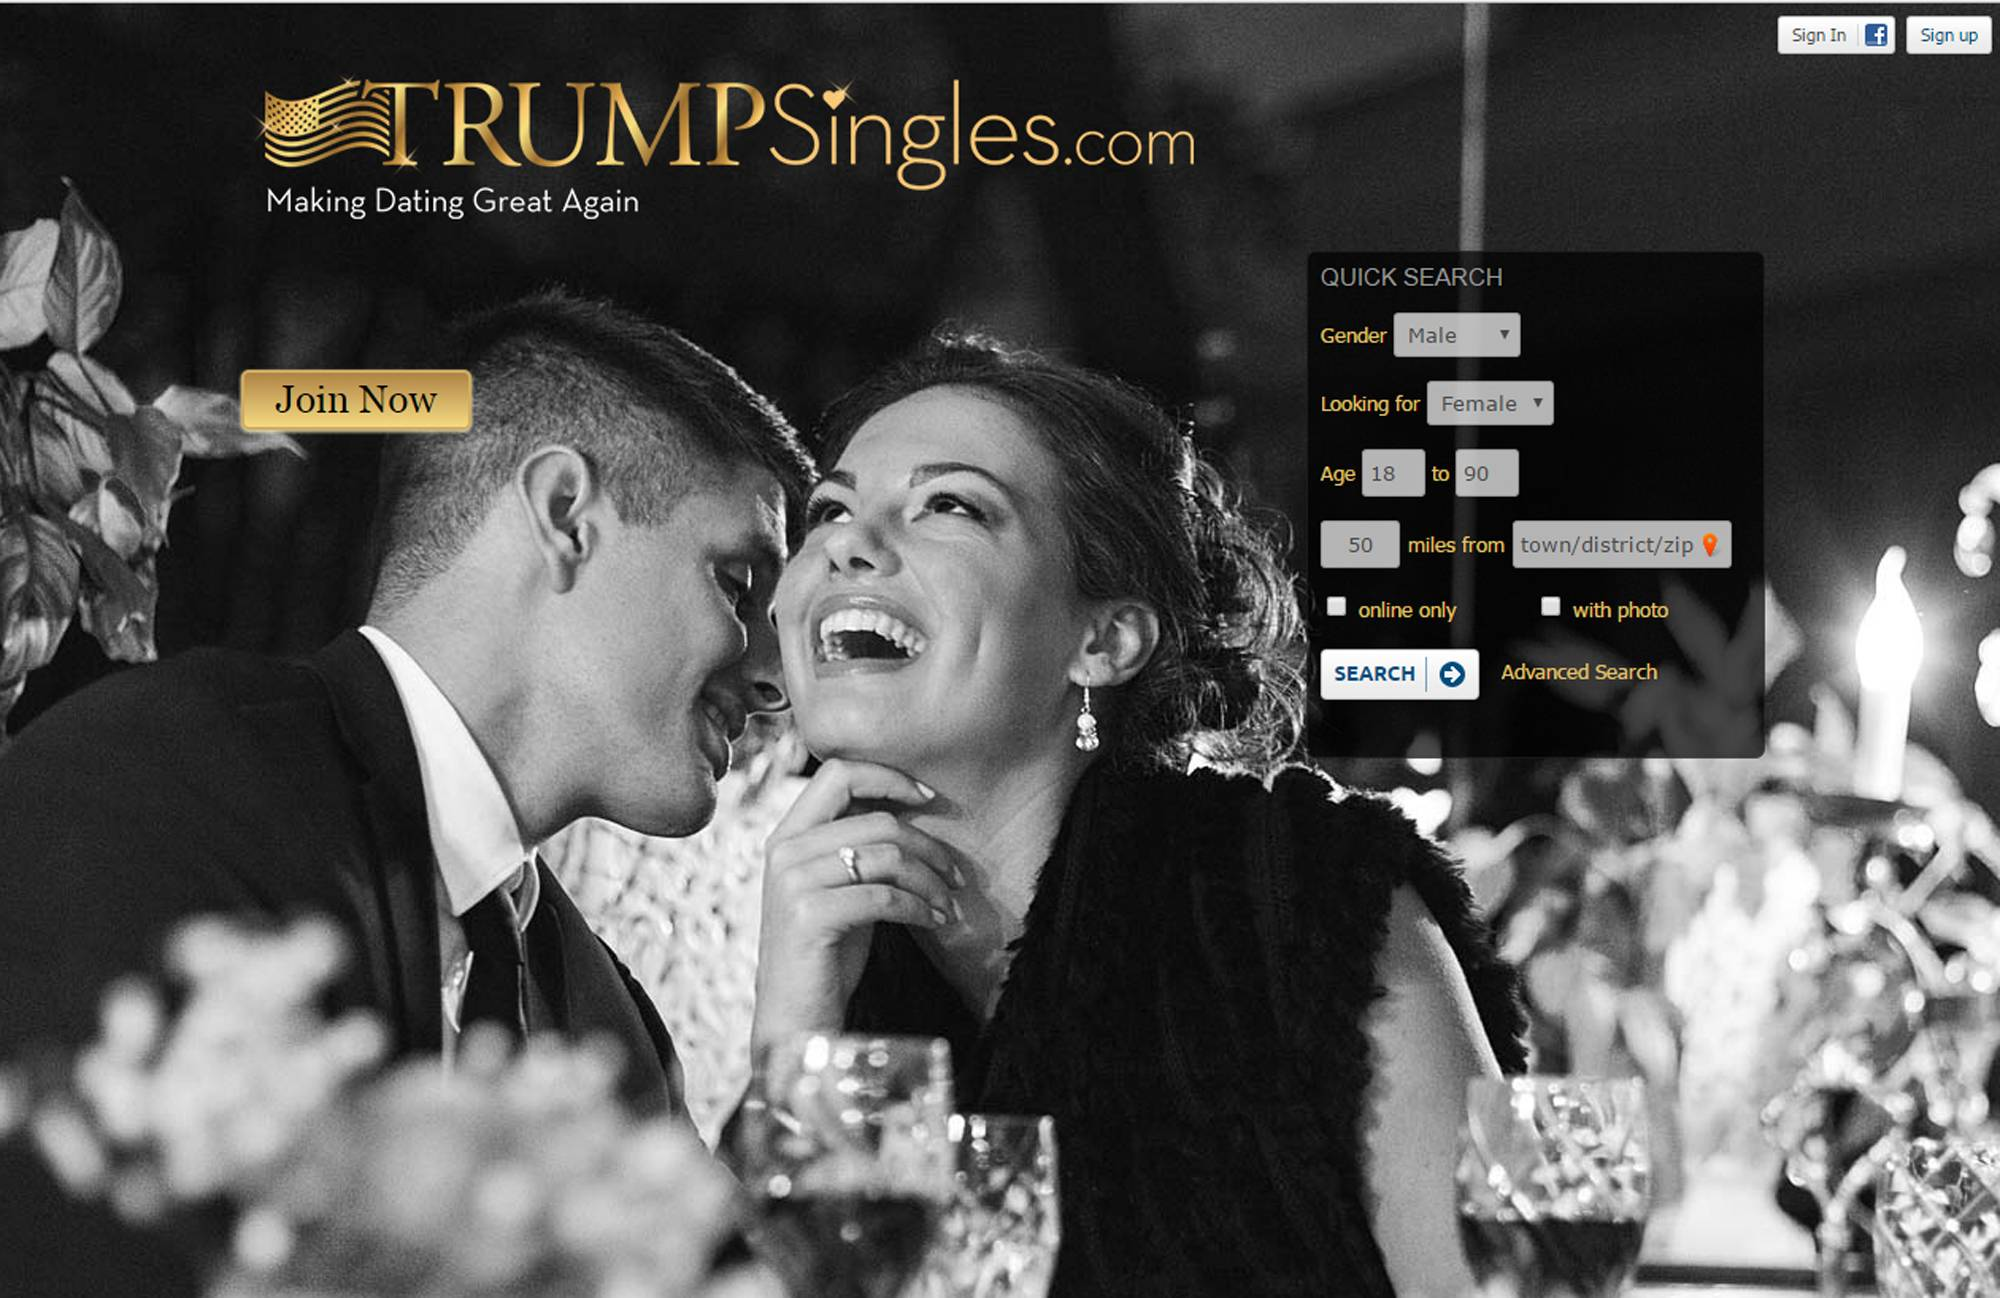 Wechat look around dating services